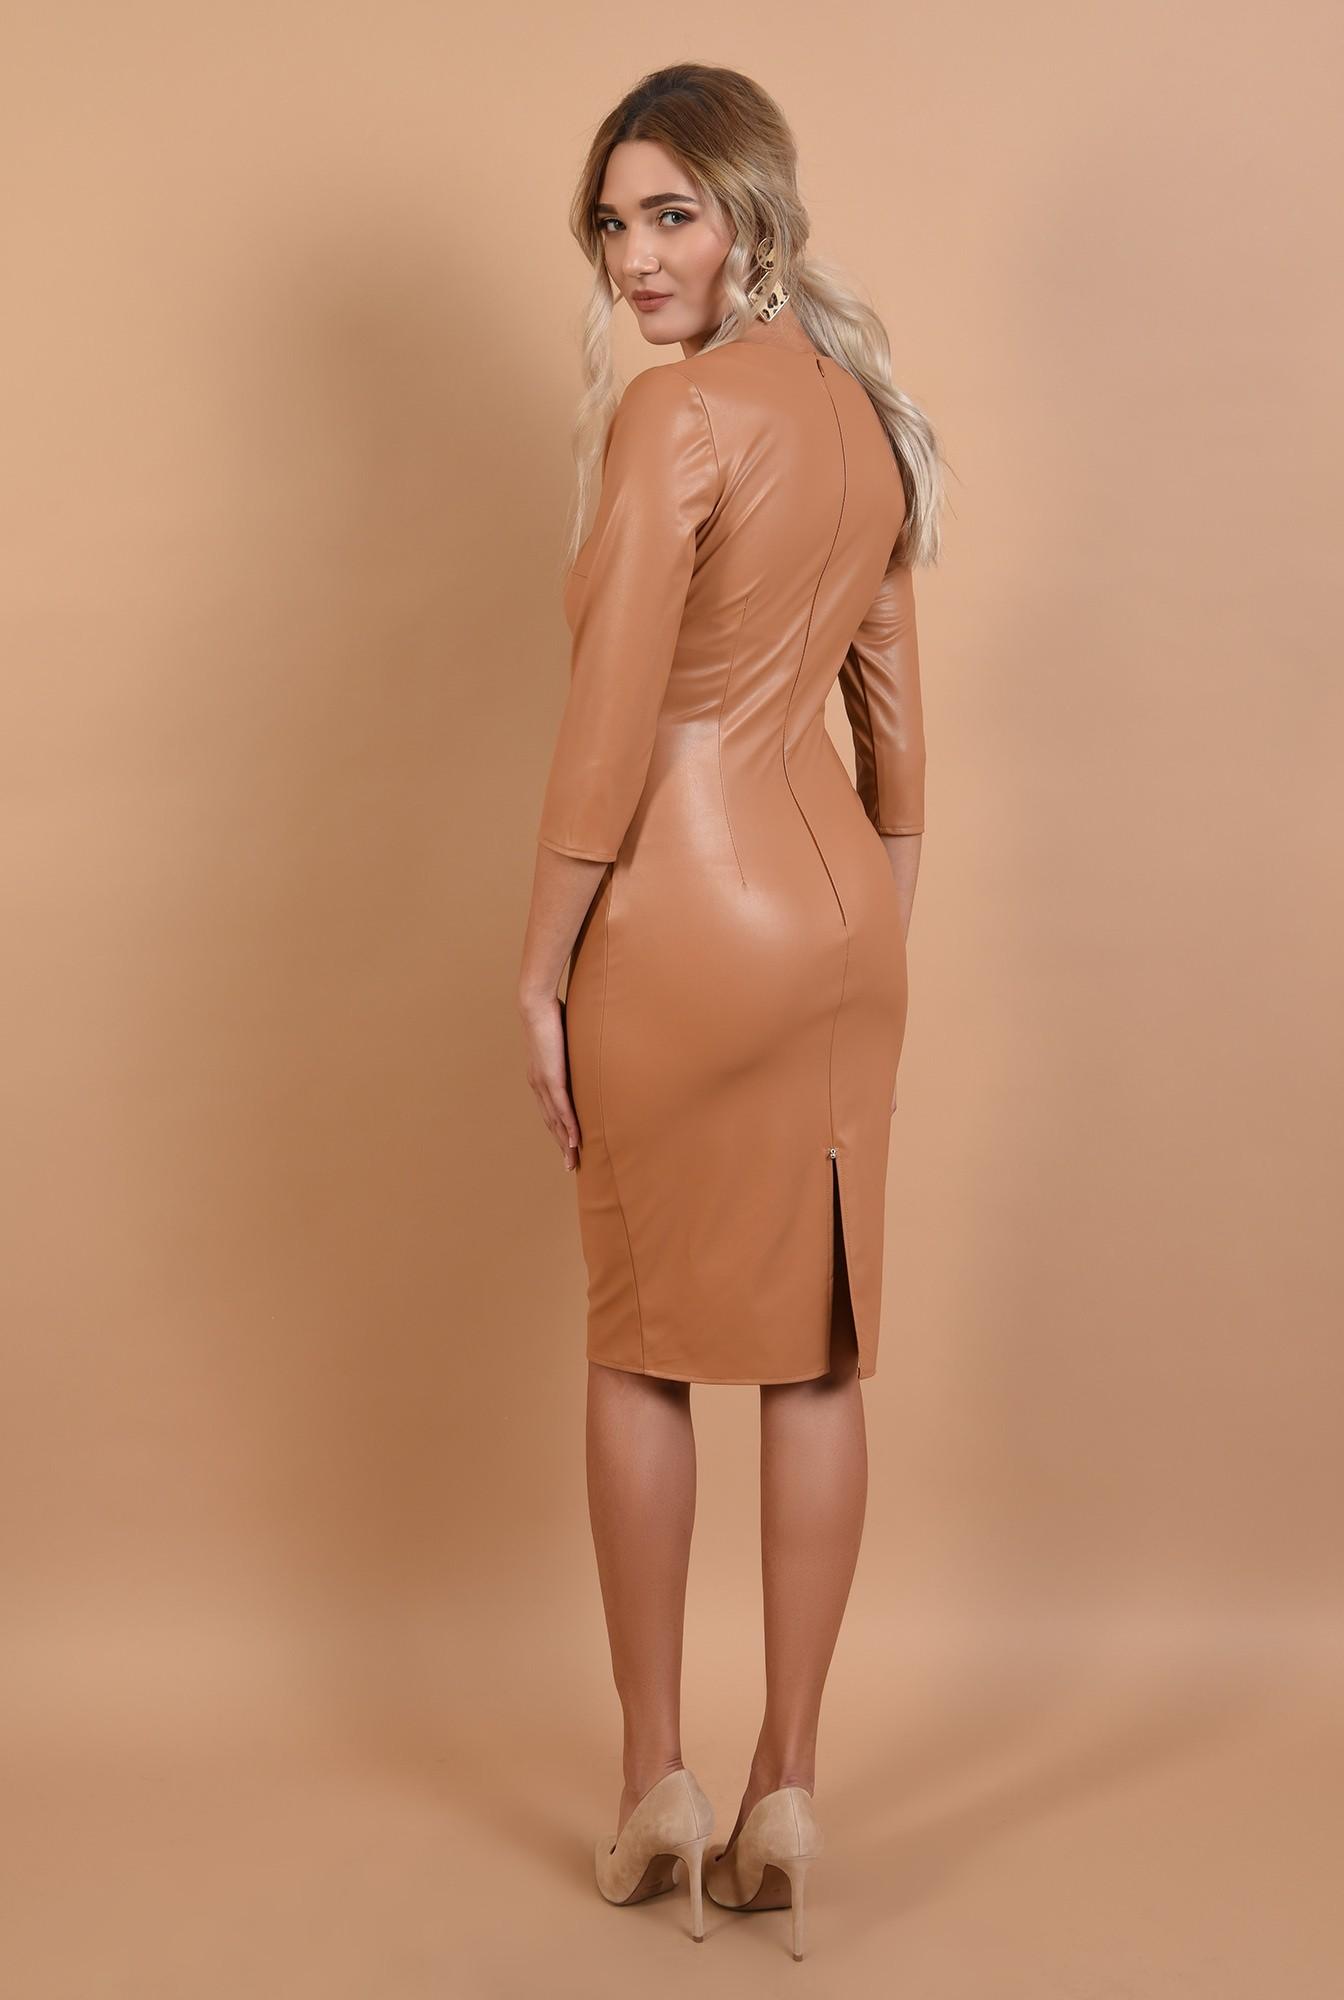 1 - 360 - rochie bej, piele ecologica, Poema, stretch, cusatura mediana